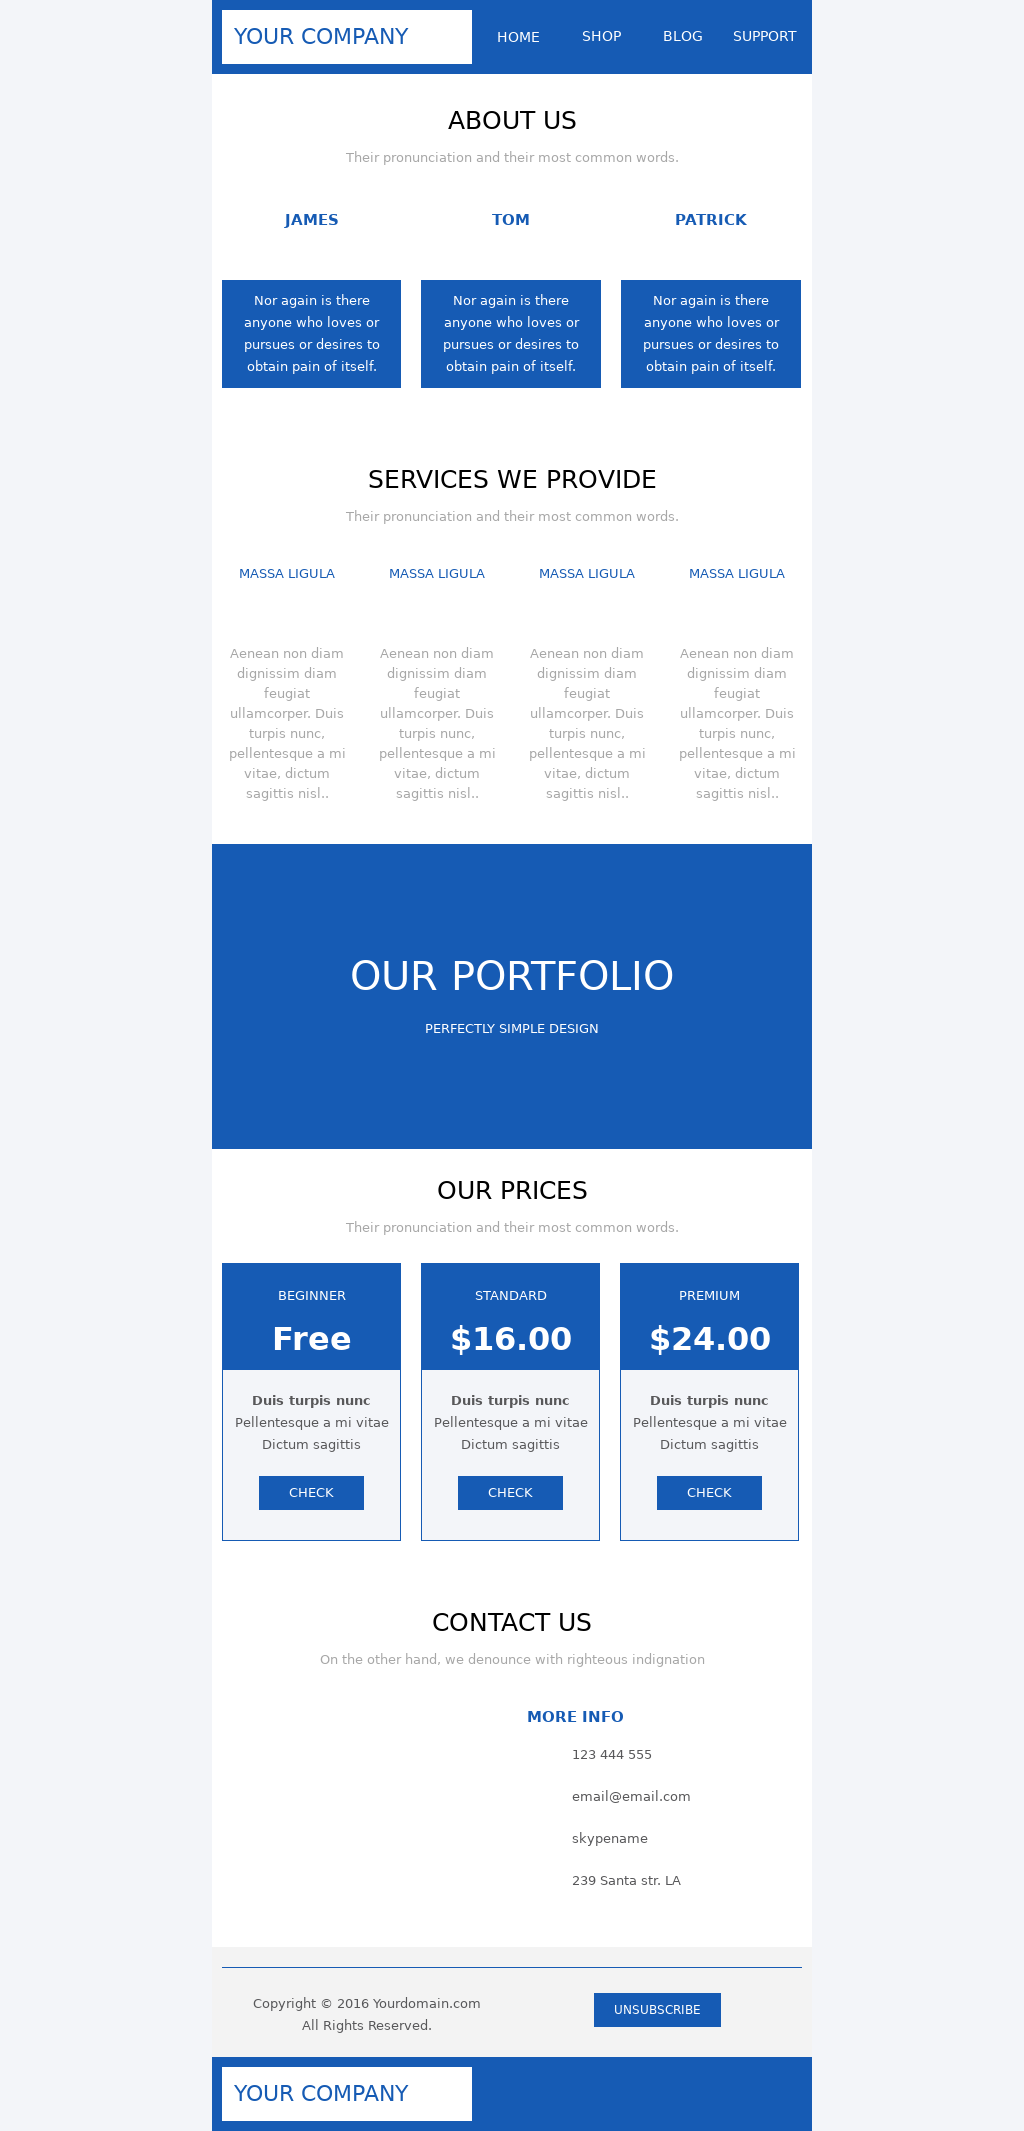 Blue sky business newsletter template